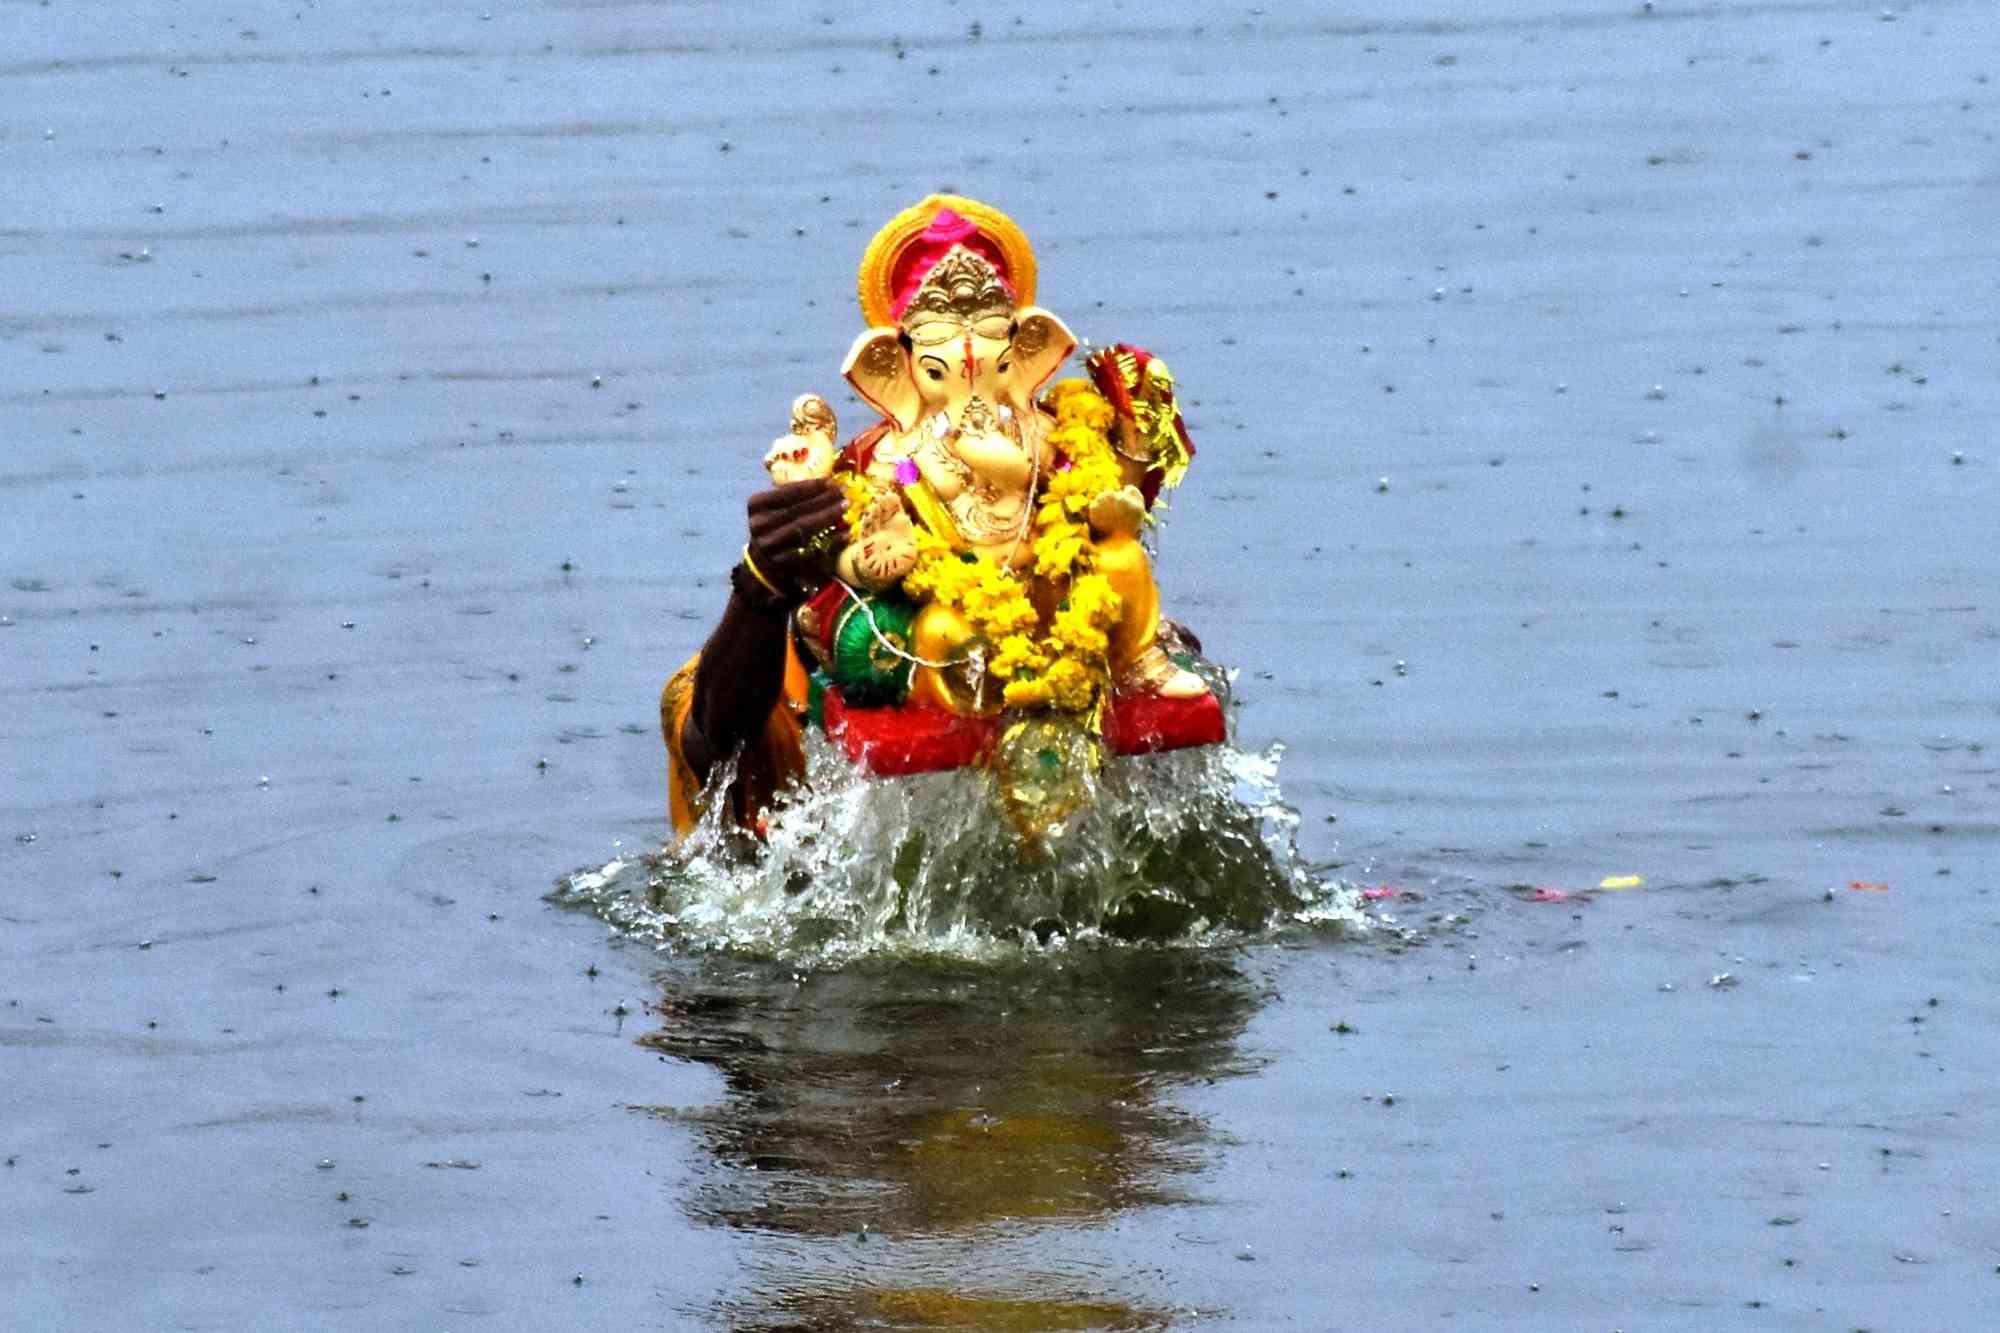 An idol of Ganesh being immersed in Jaipur's Man Sagar lake on Sunday. (Credit: IANS)